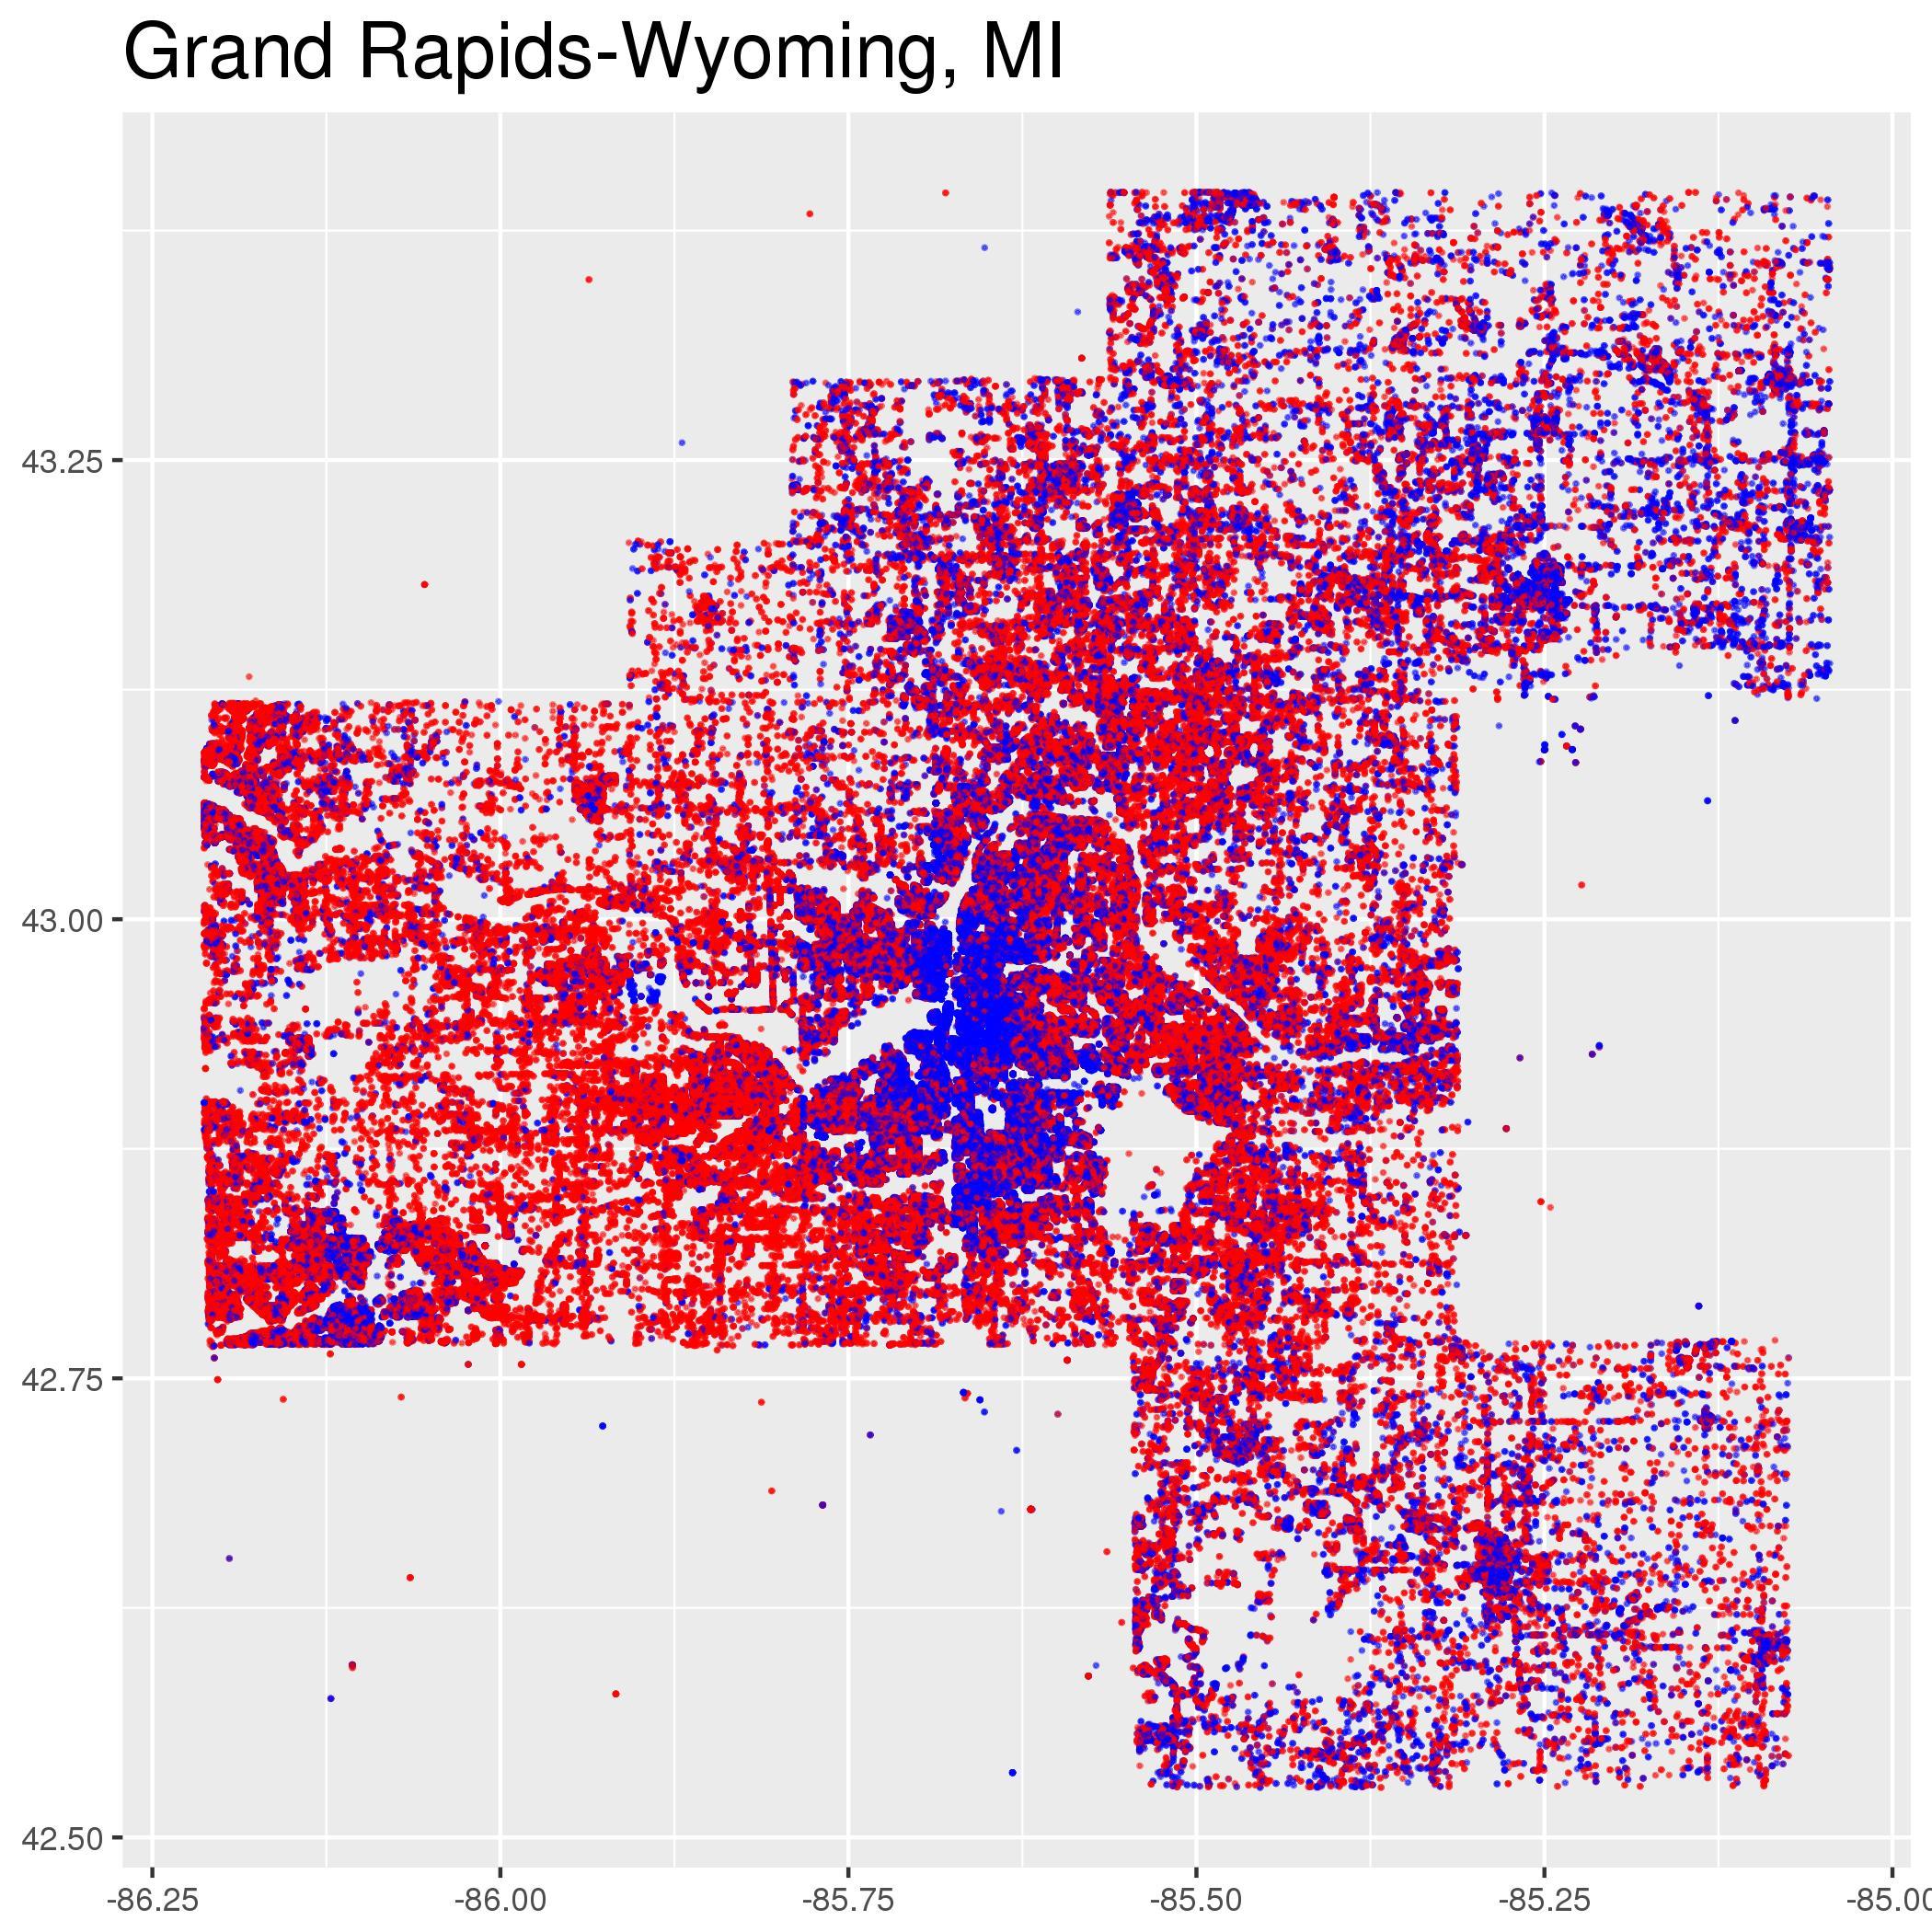 GrandRapids-WyomingMI.jpeg